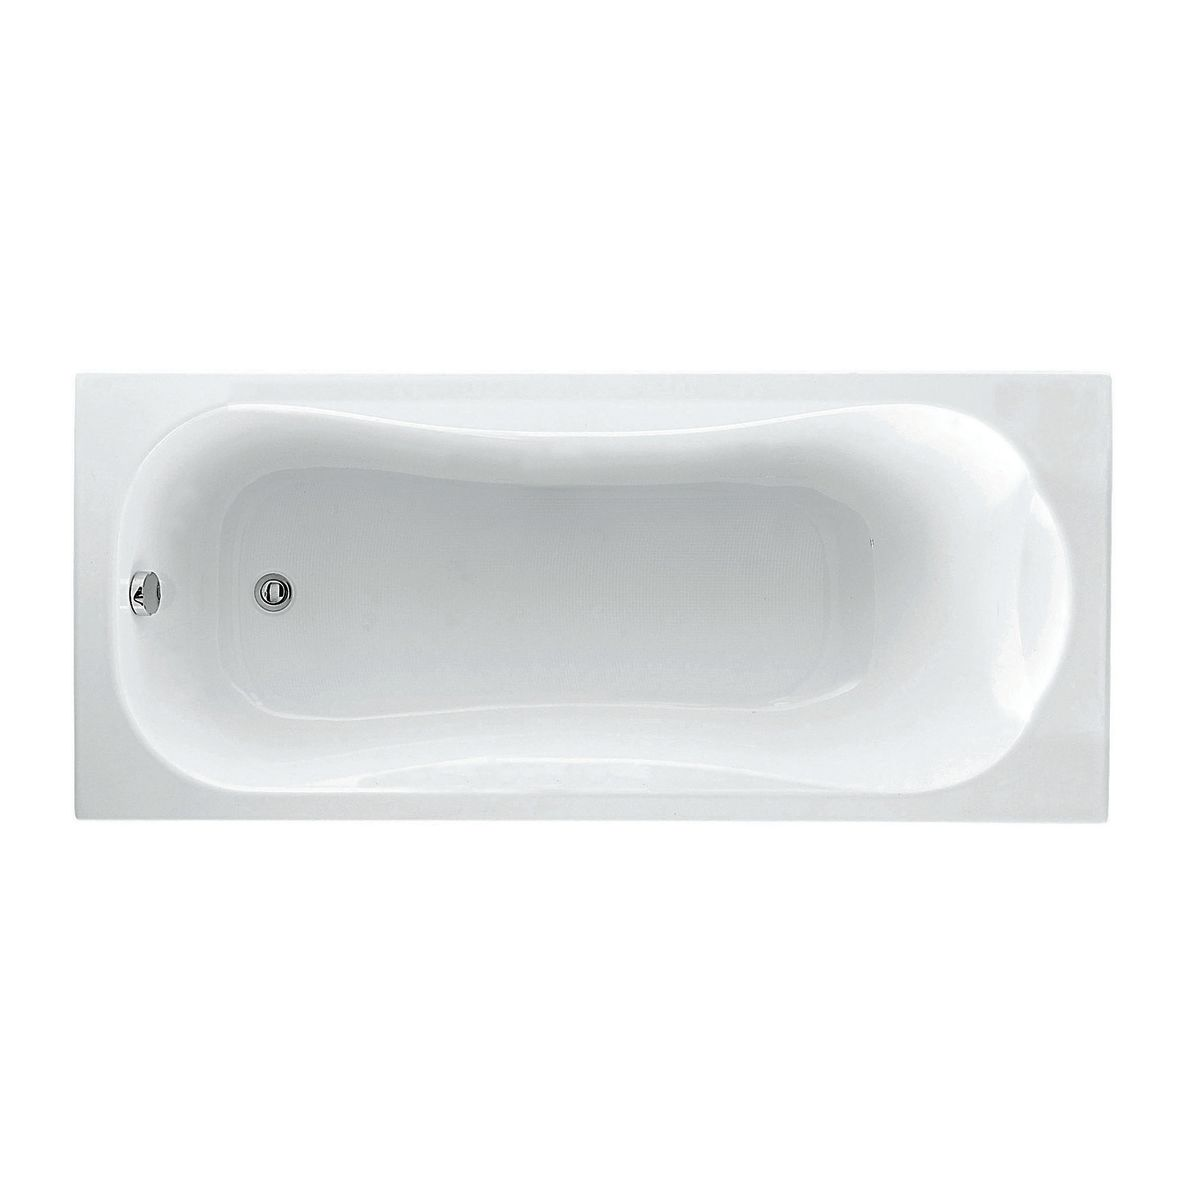 Vasche Da Bagno Piccole In Vetroresina.Verniciare Vasca Da Bagno In Vetroresina Latest Per Rb Vasche Da